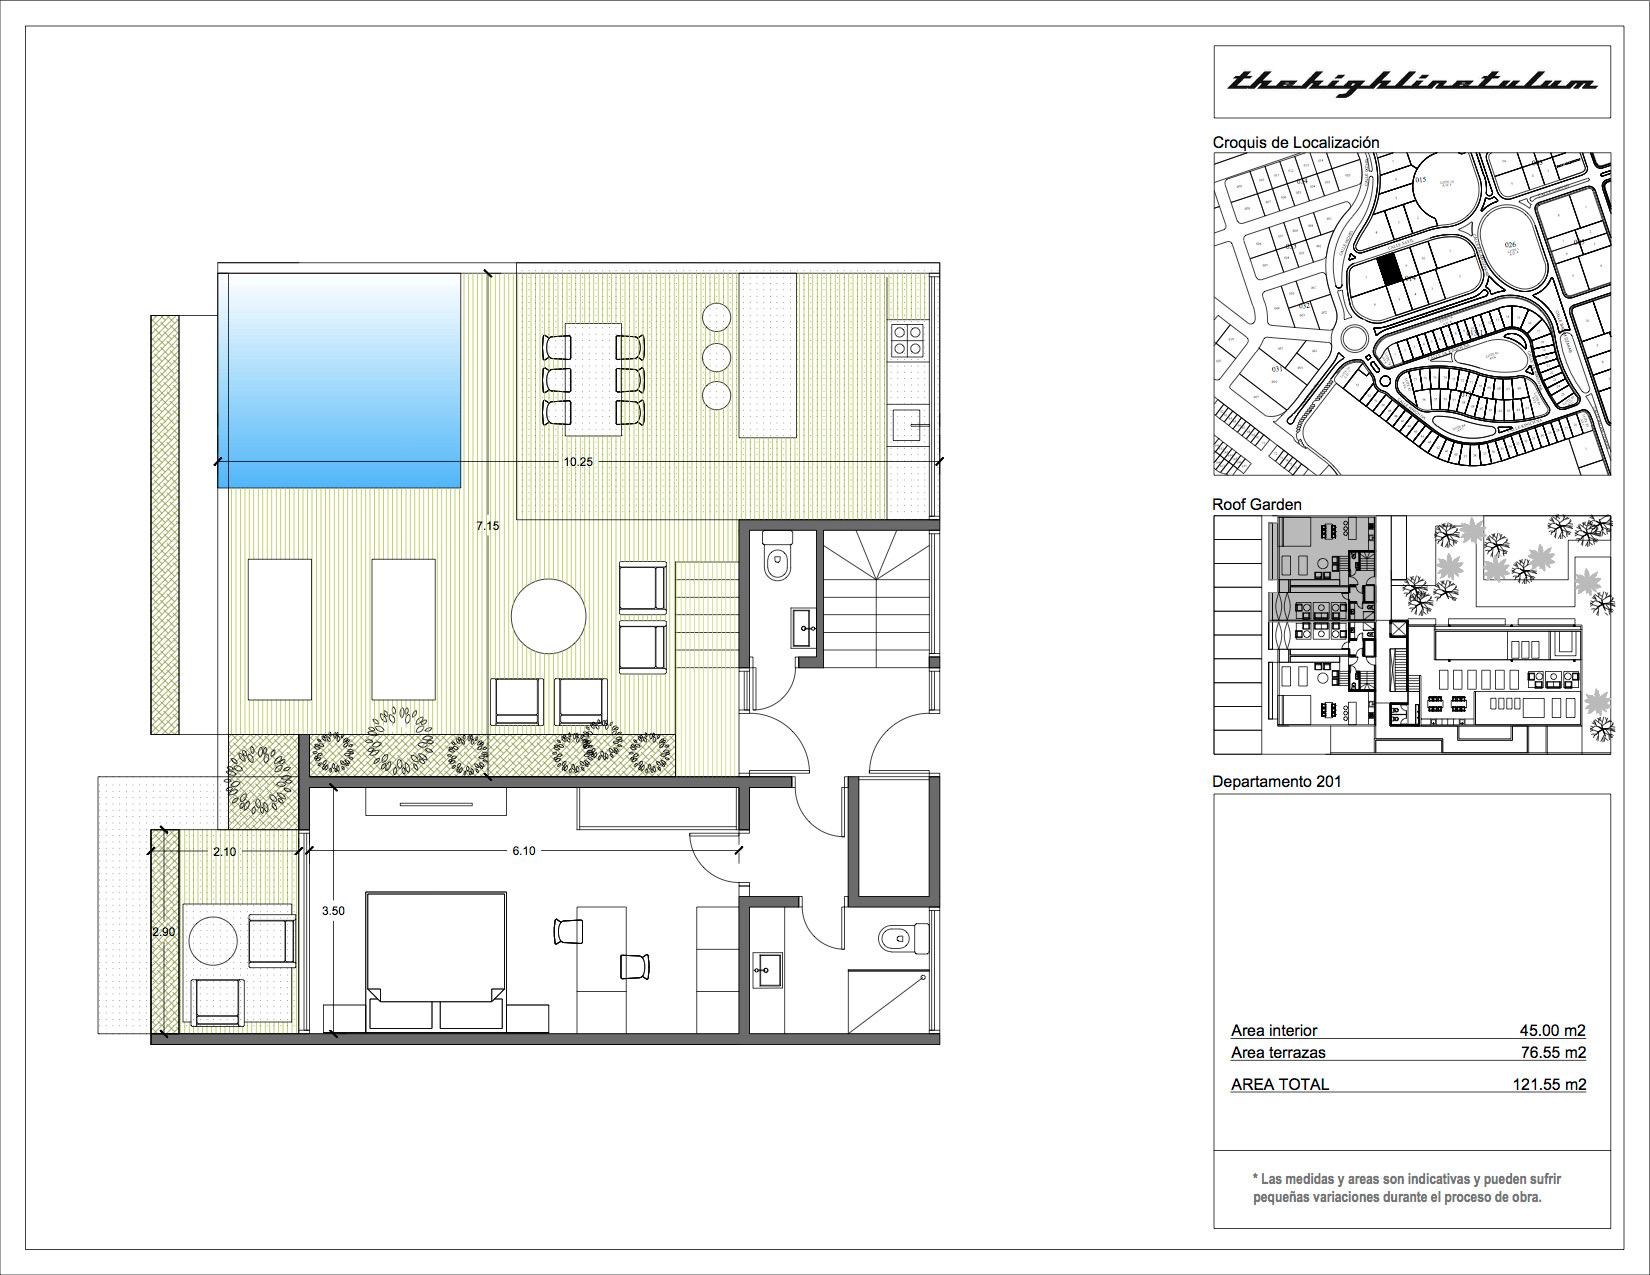 301 Studio + Private Pool:Terrace.jpg